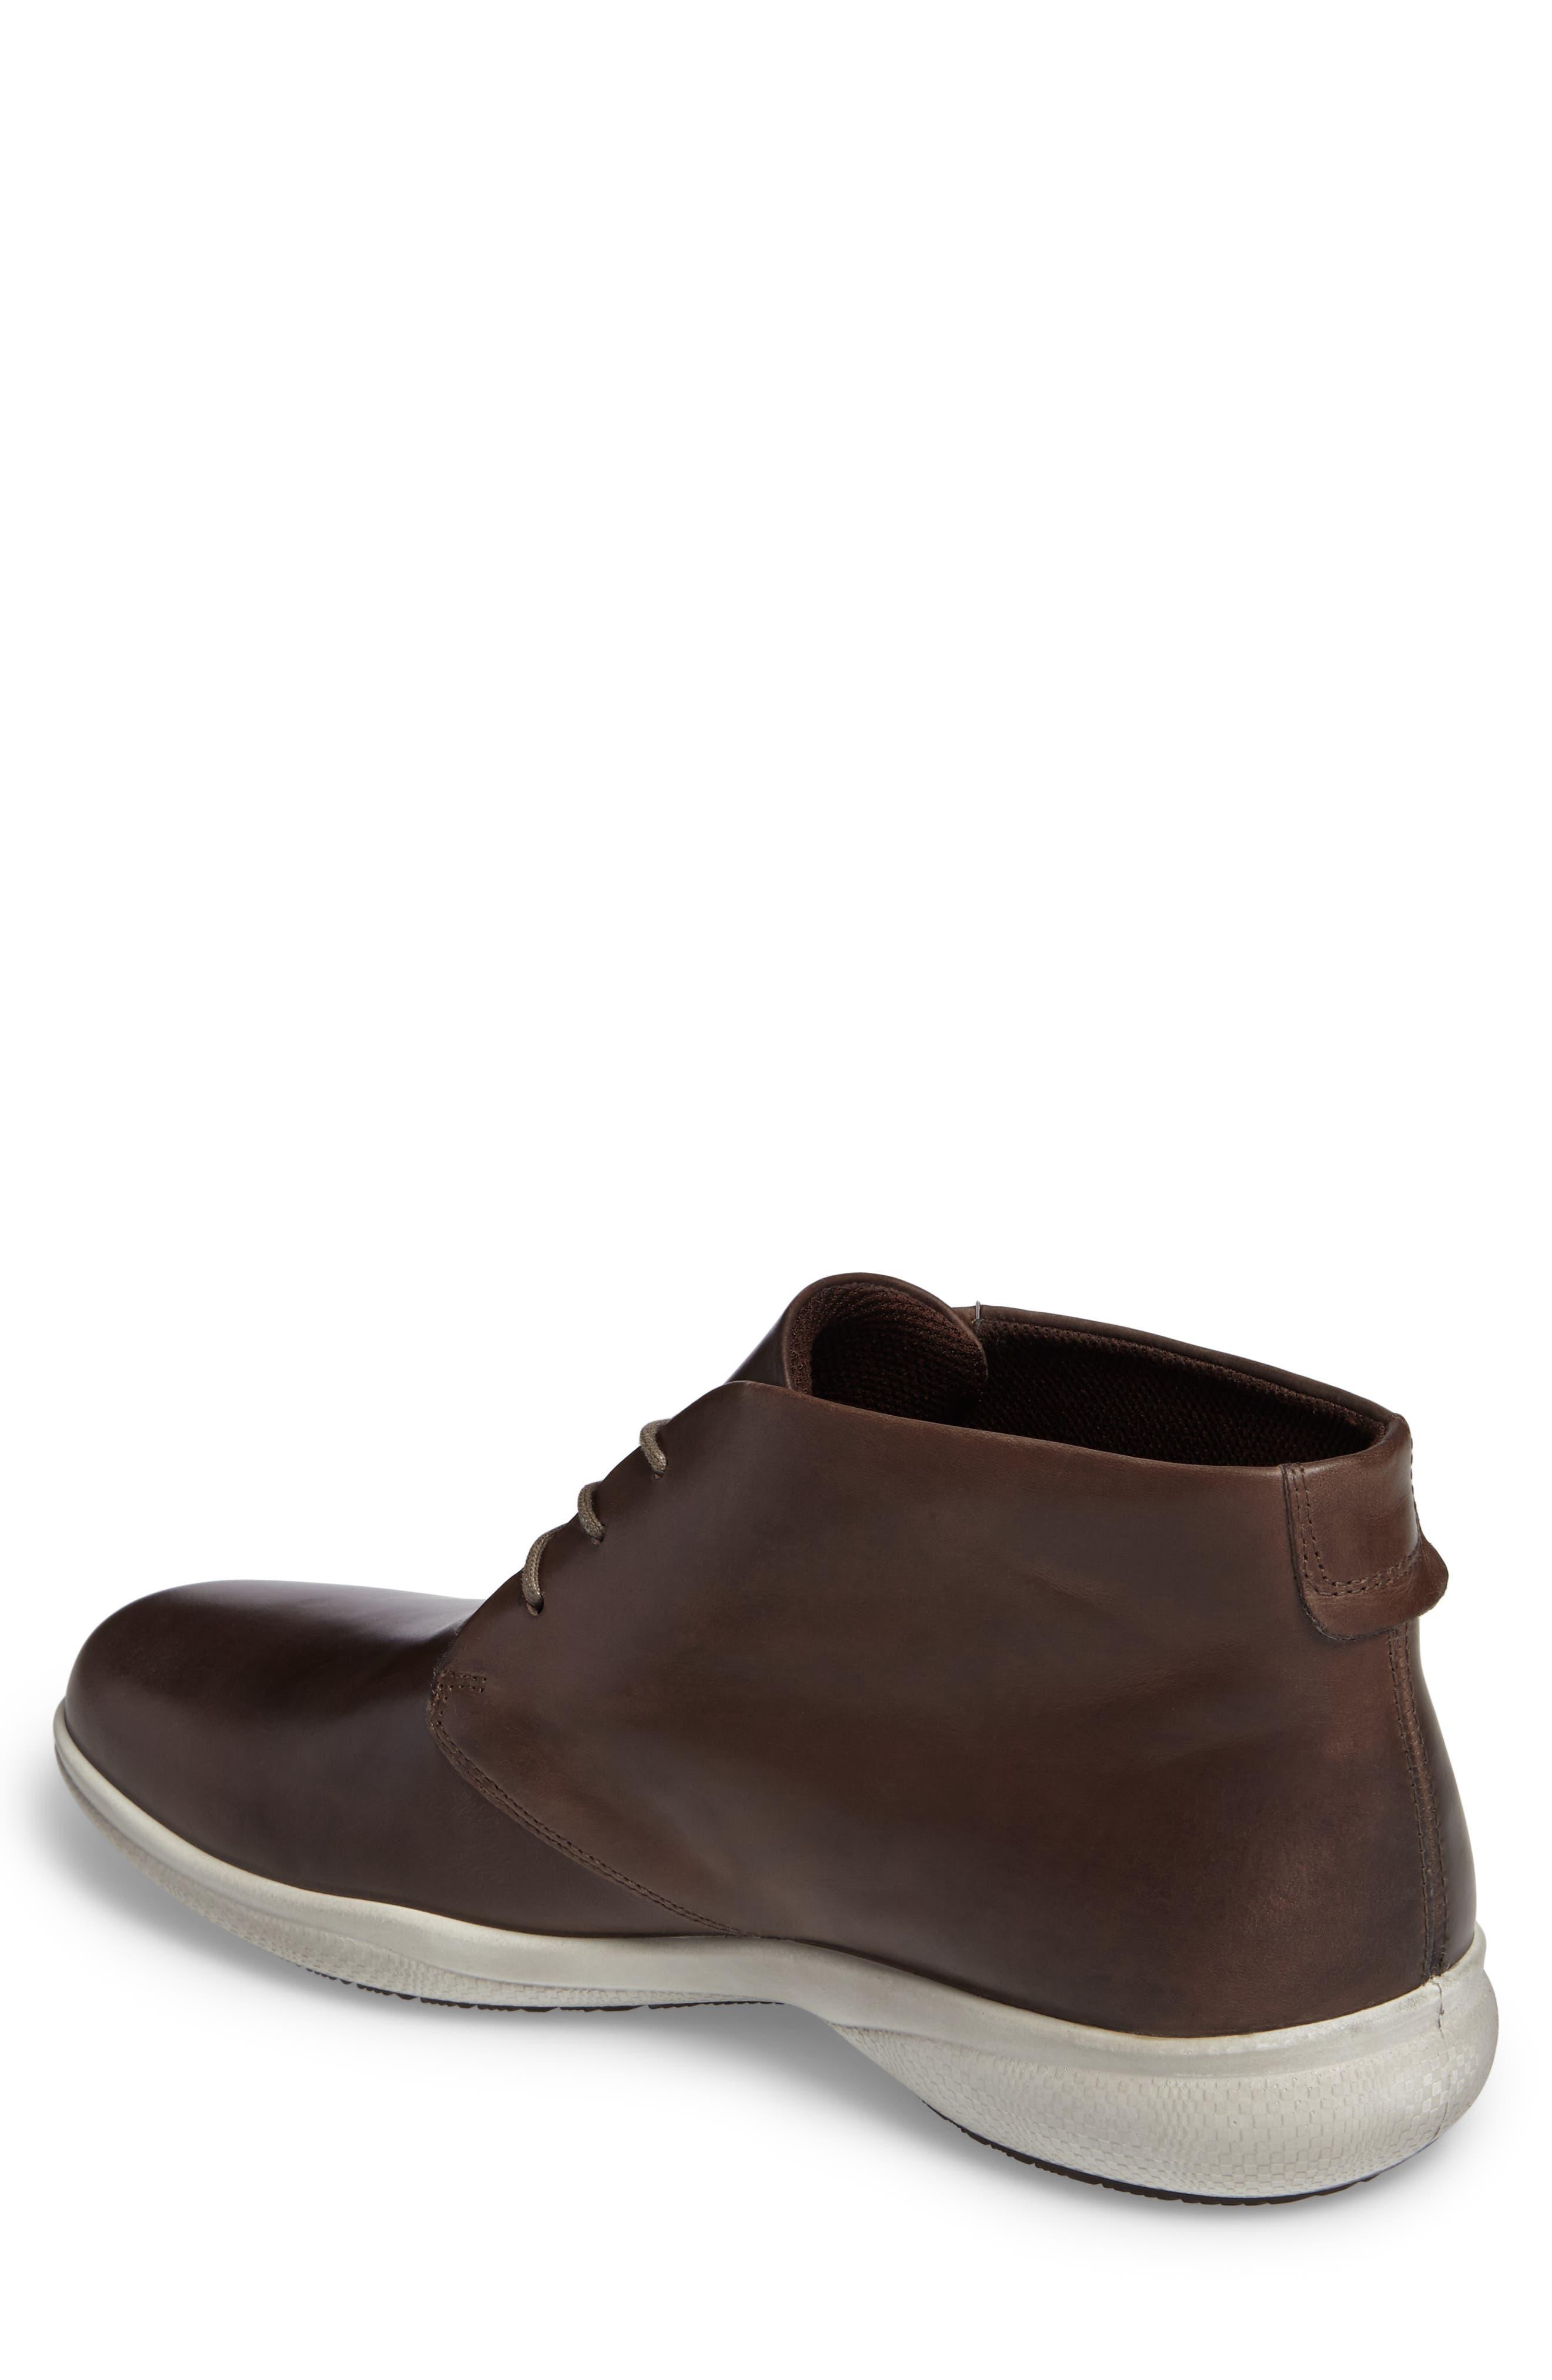 Alternate Image 2  - ECCO 'Grenoble' Chukka Boot (Men)